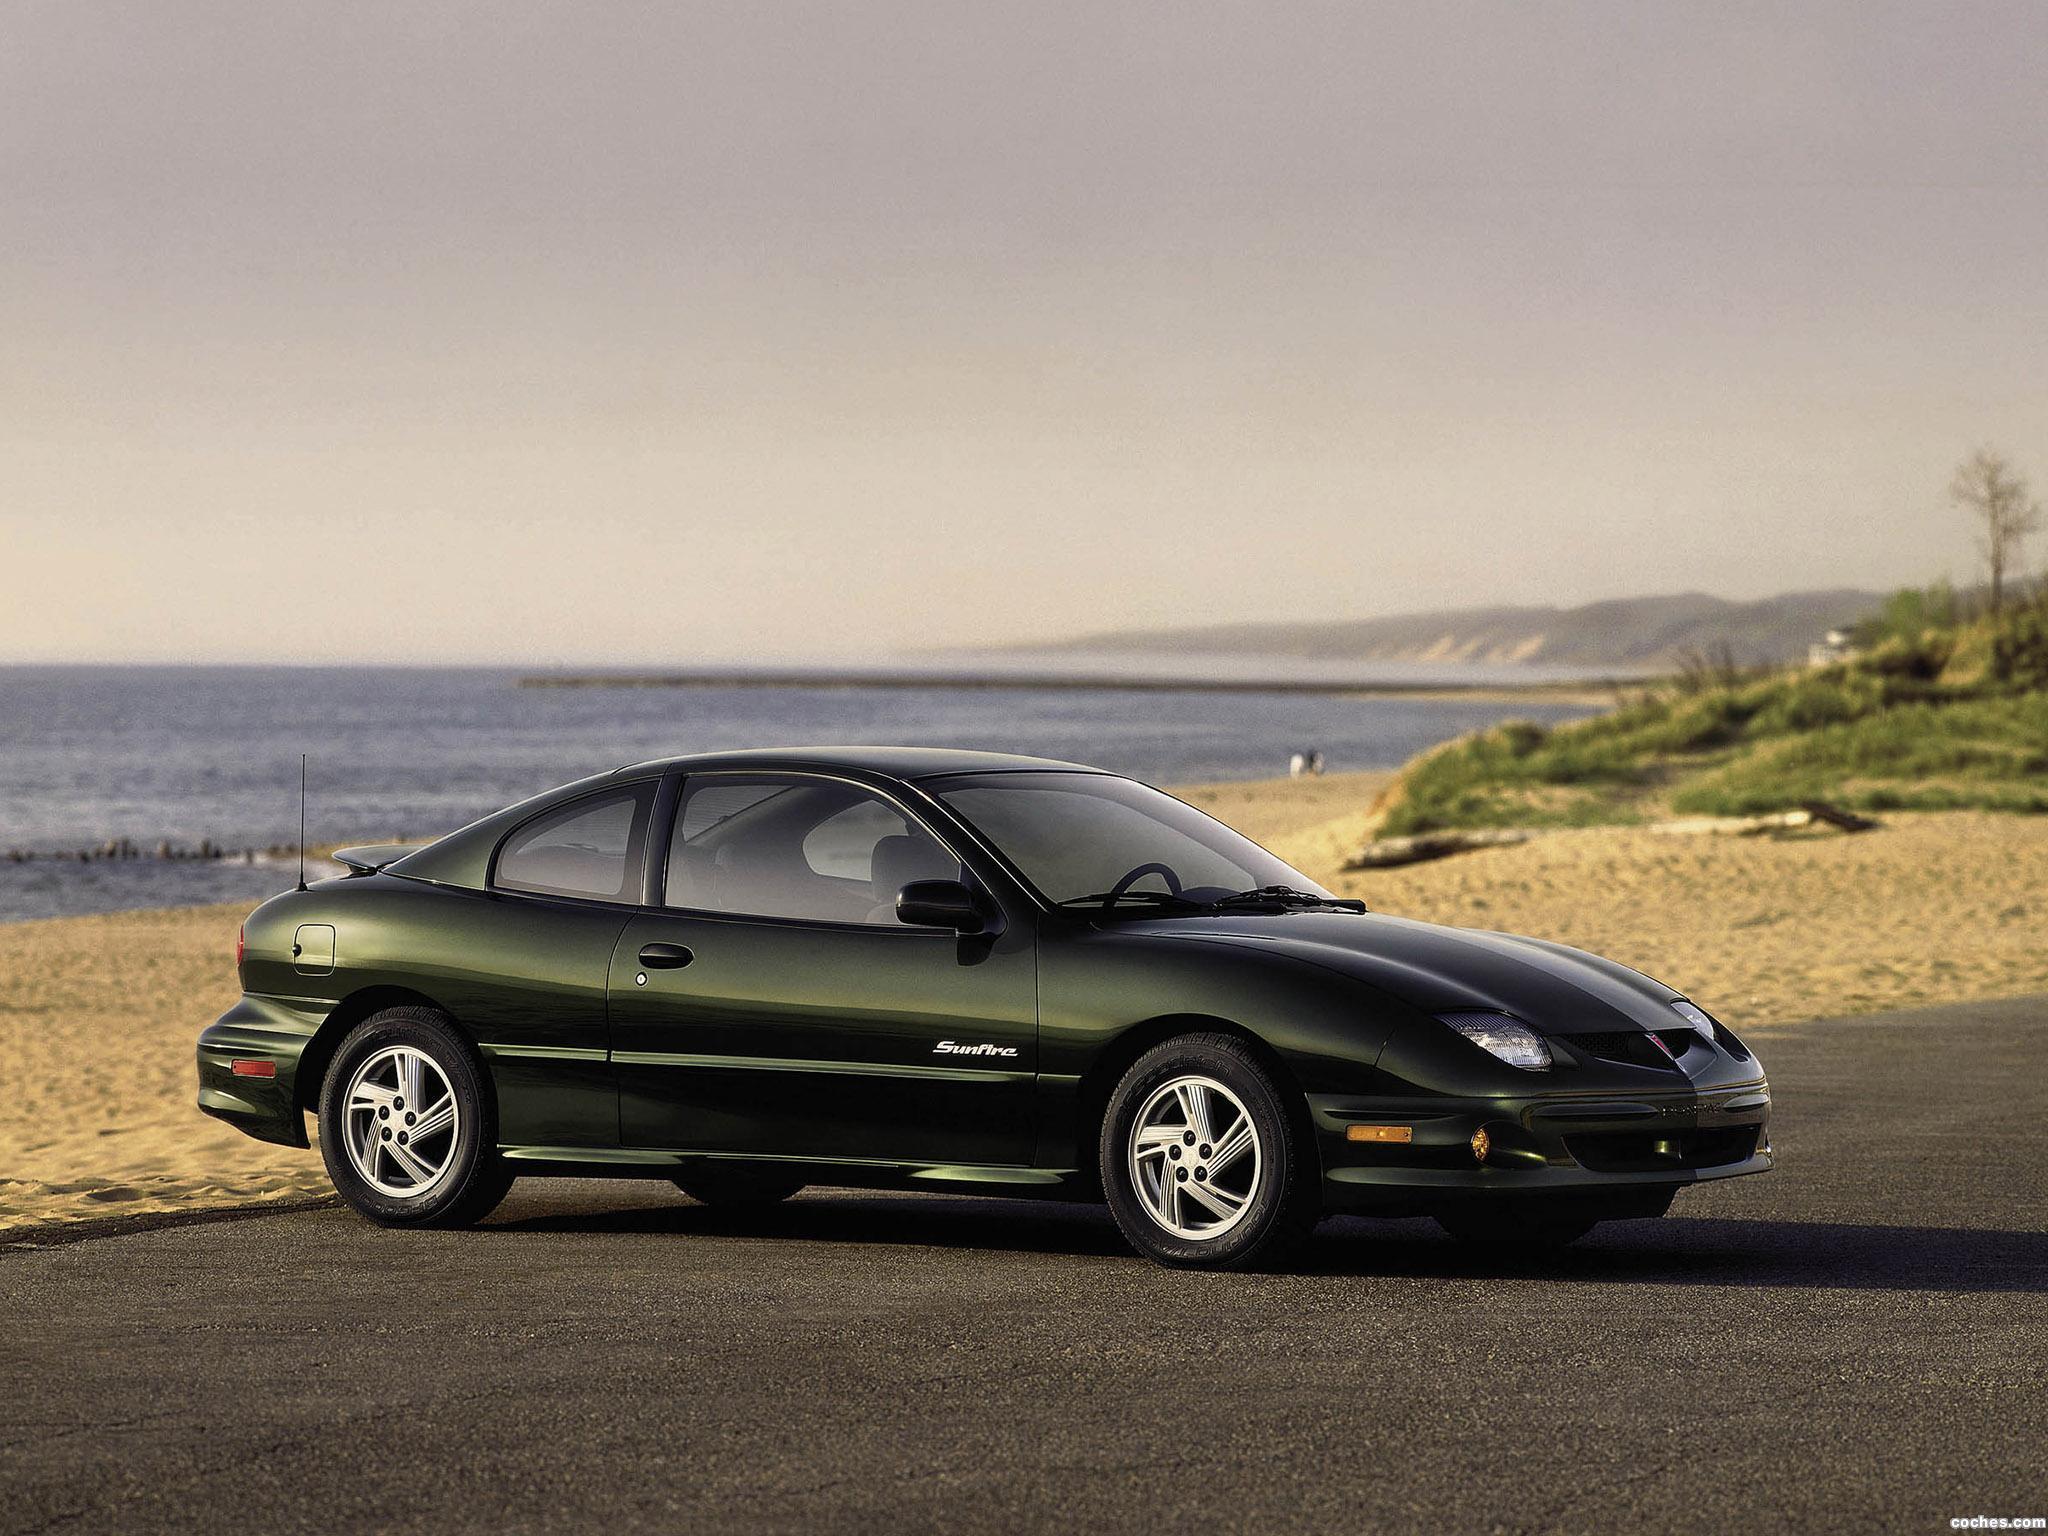 Foto 0 de Pontiac Sunfire 1999